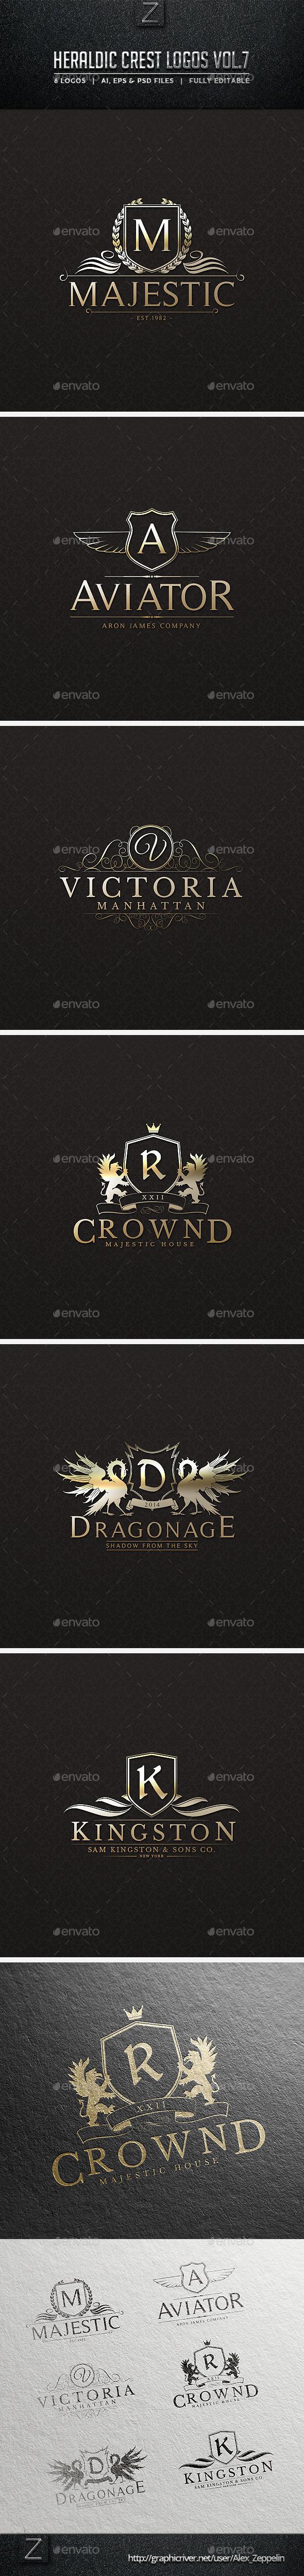 GraphicRiver Heraldic Crest Logos Vol.7 10578758